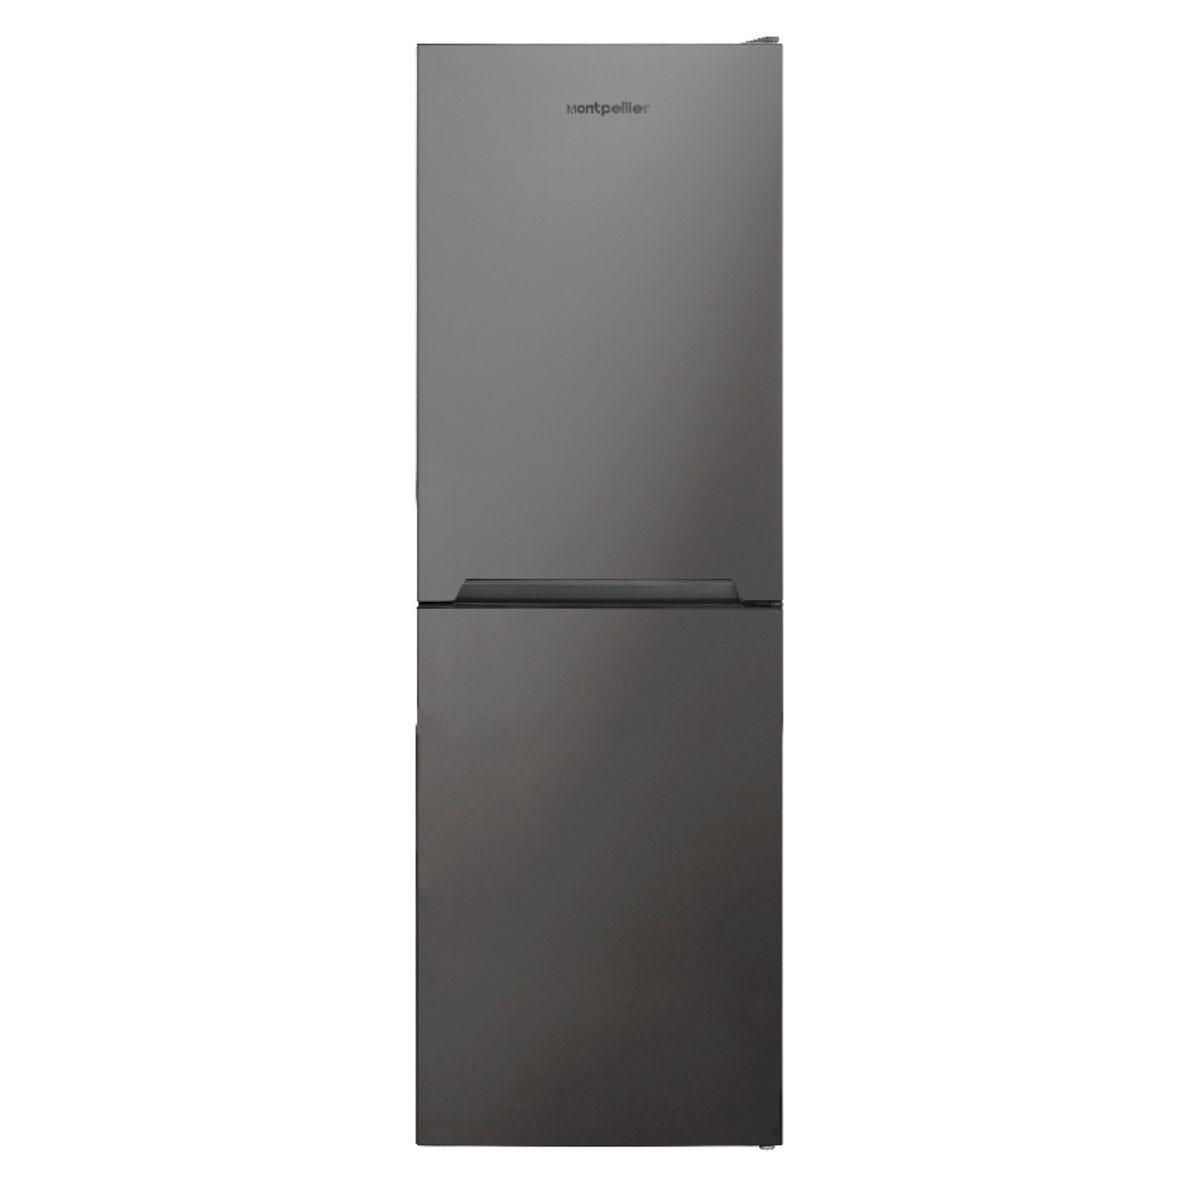 Montpellier MFF165S 54cm 50/50 Frost Free Fridge Freezer - Silver